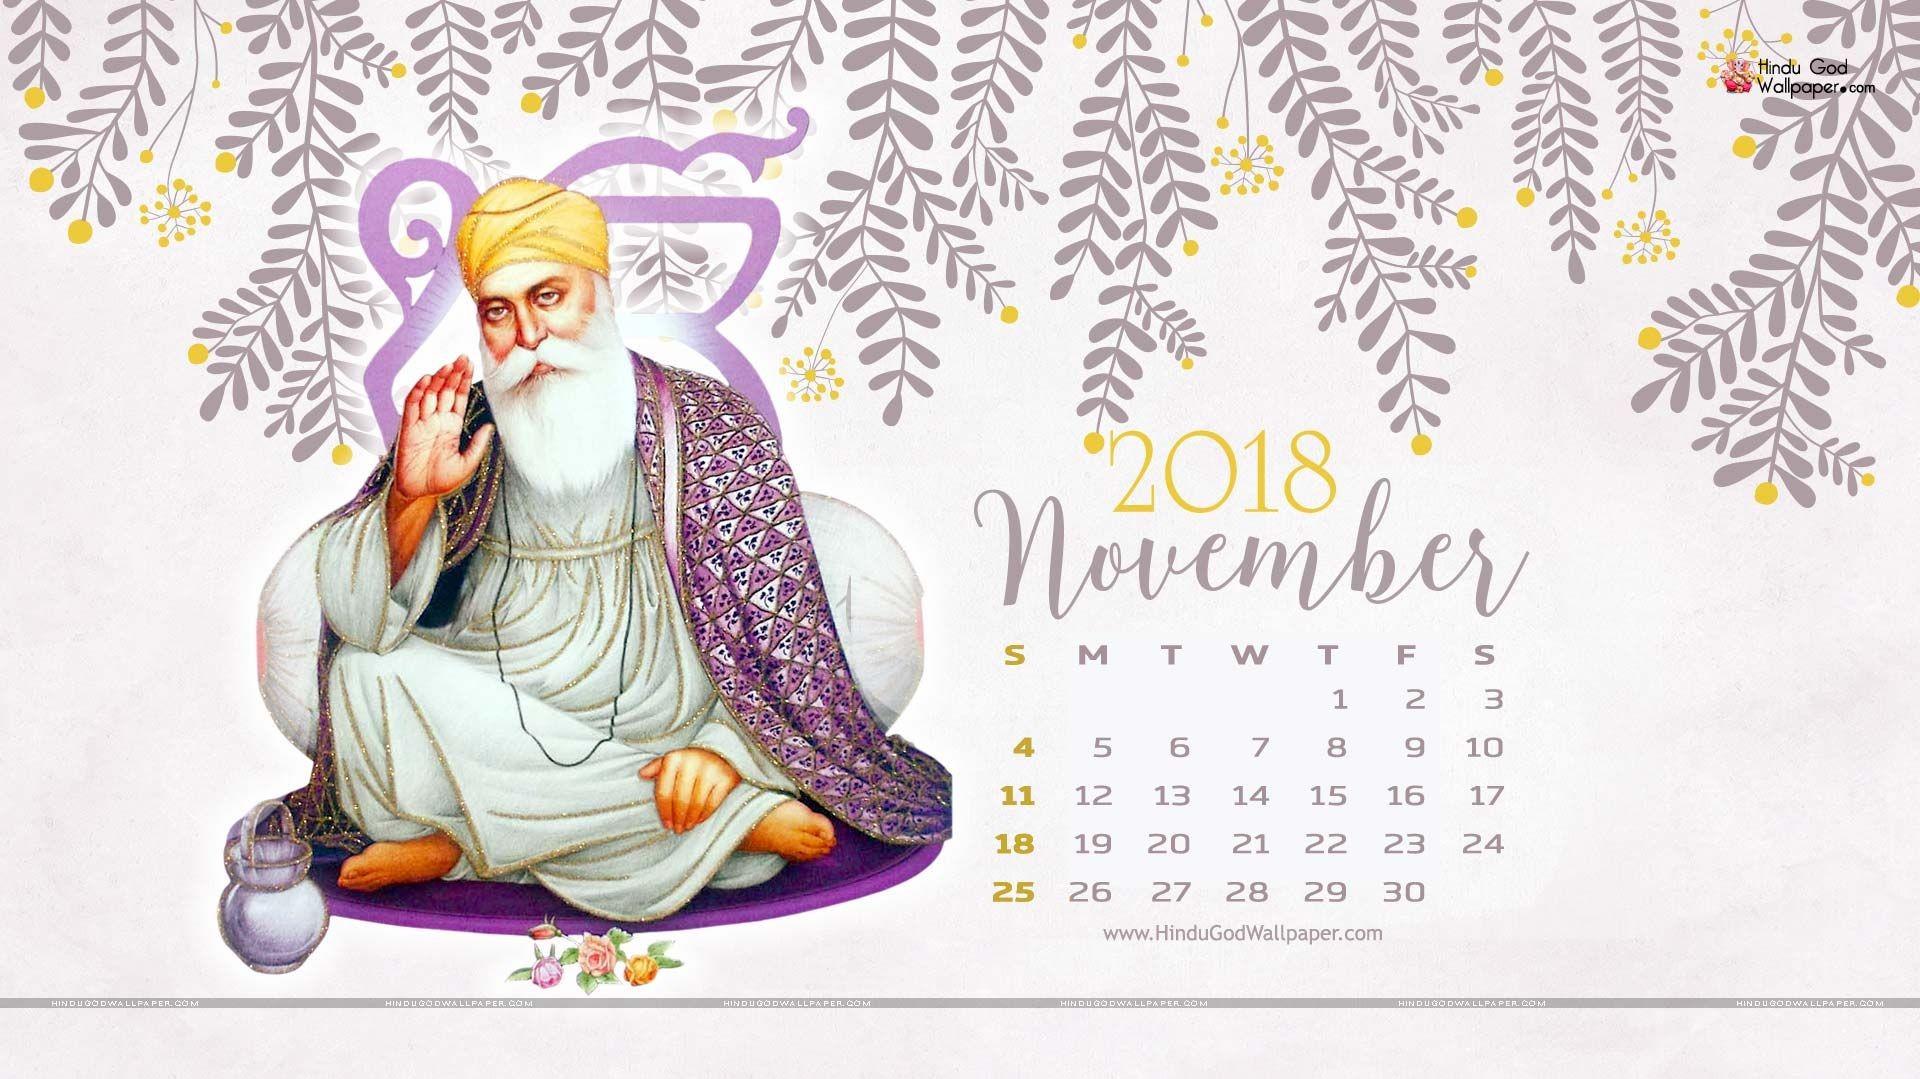 November 2018 Desktop Calendar Wallpaper & HD Background Free Download Desktop Calendars Calendar Wallpaper